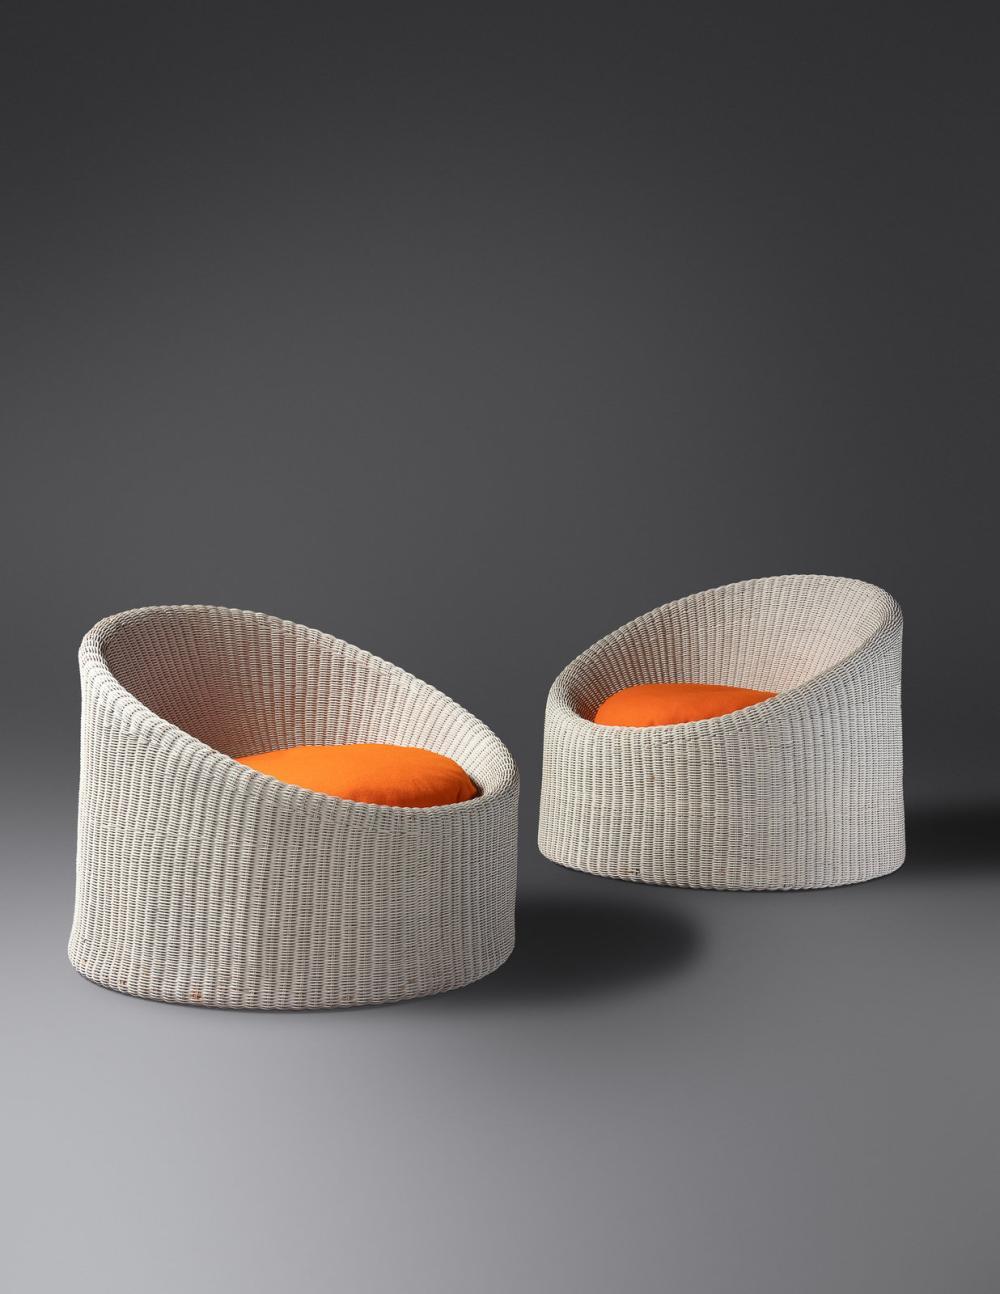 Eero Aarnio (Finnish, b. 1932) Pair of Lounge Chairs